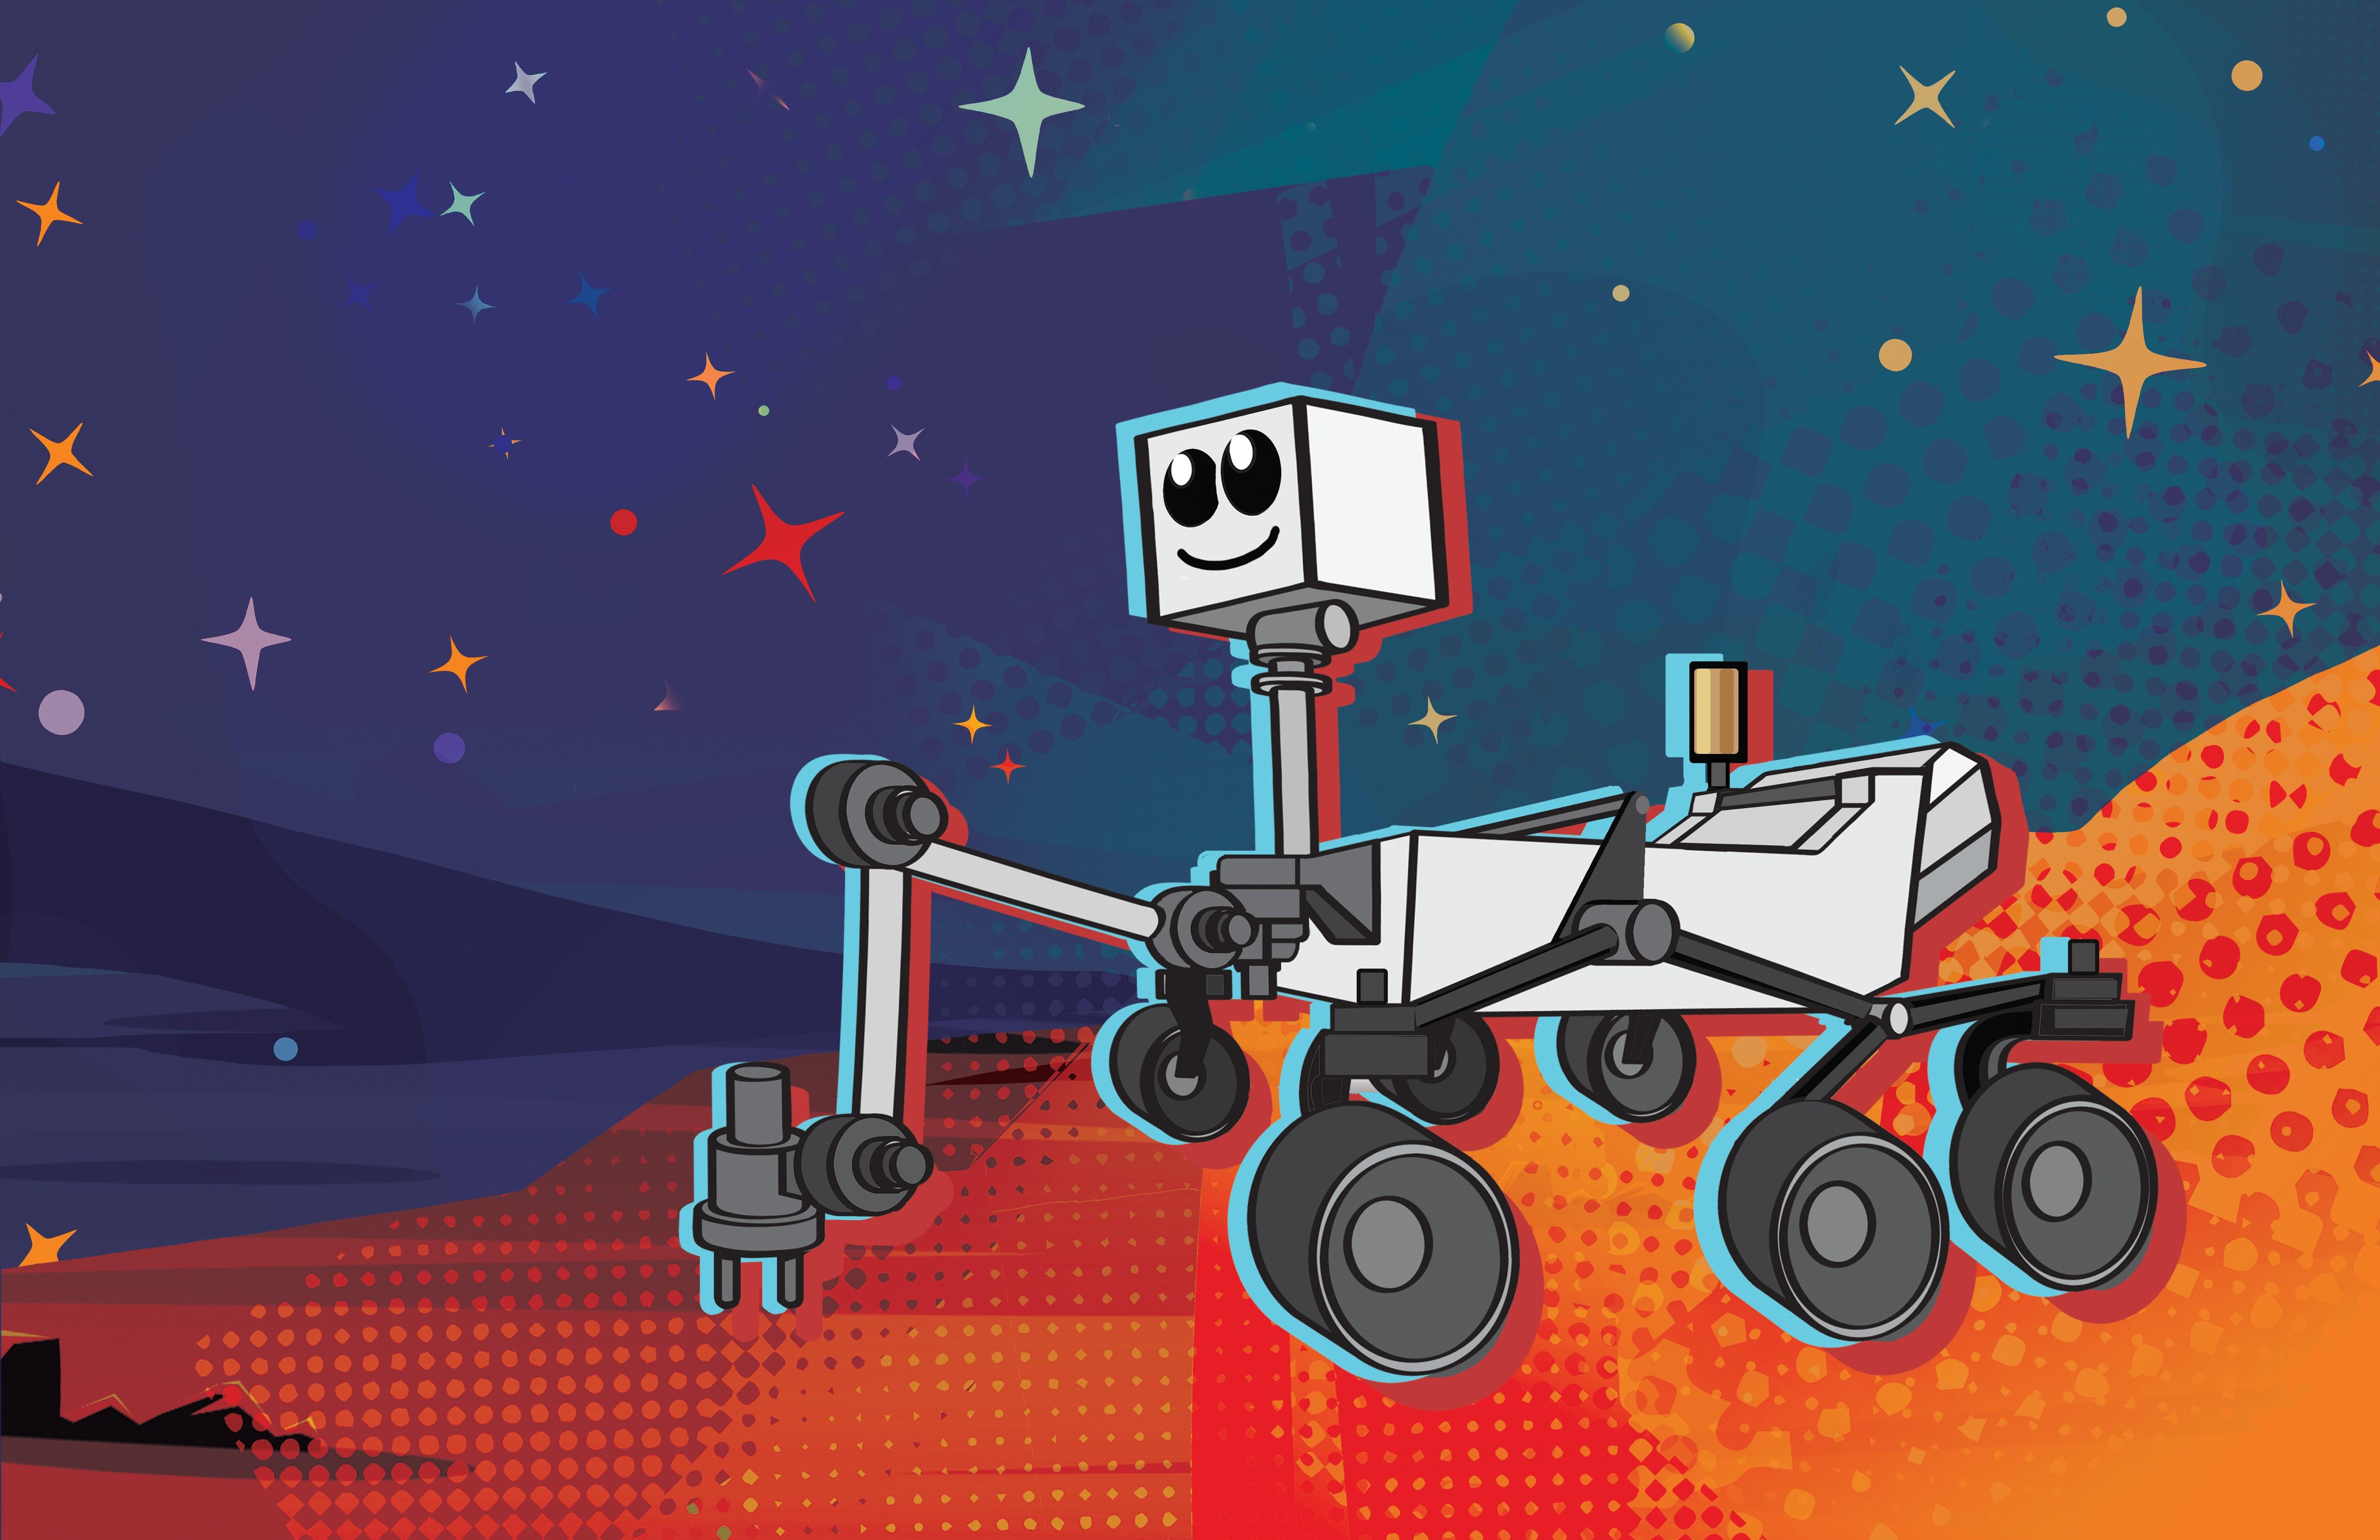 Rover Mars 2020 (Foto: NASA )